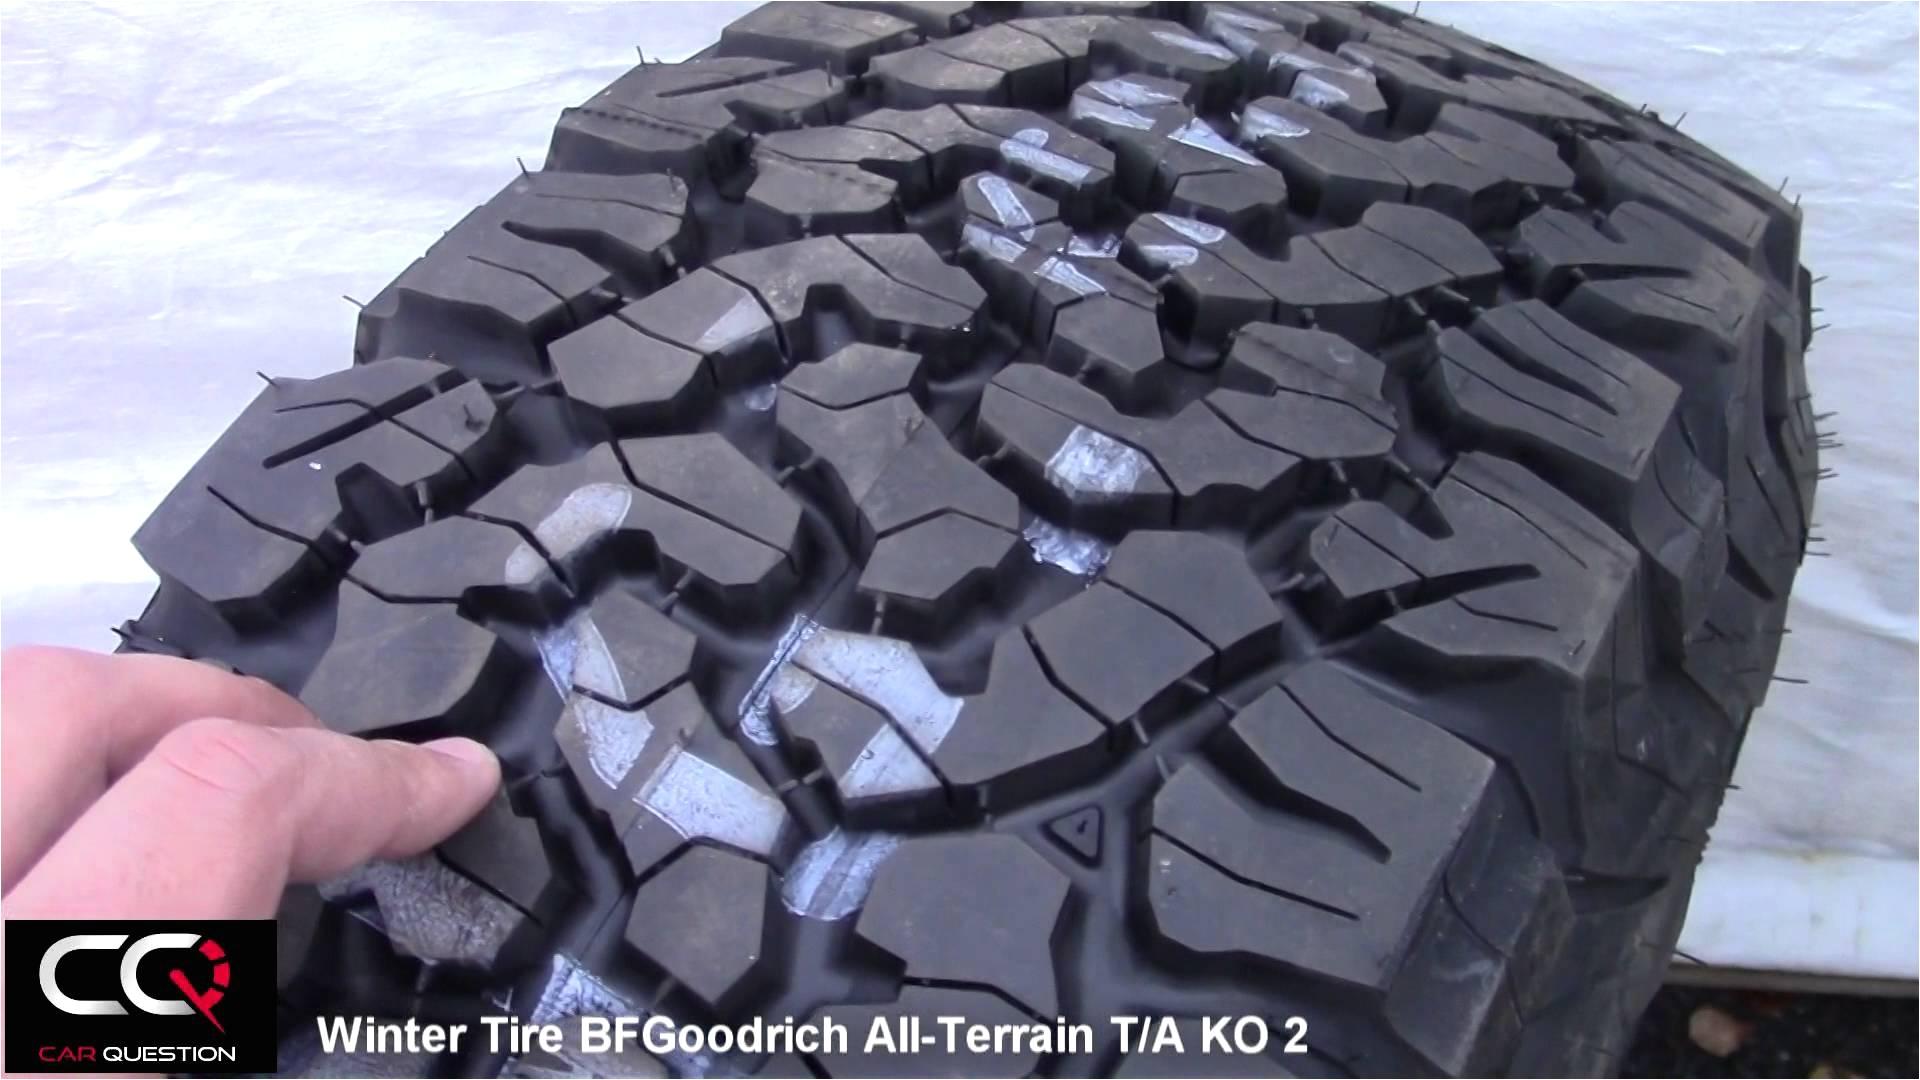 Pneu Bf Goodrich Rugged Trail Ta Winter Tire Review Bfgoodrich All Terrain T A Ko2 Simply The